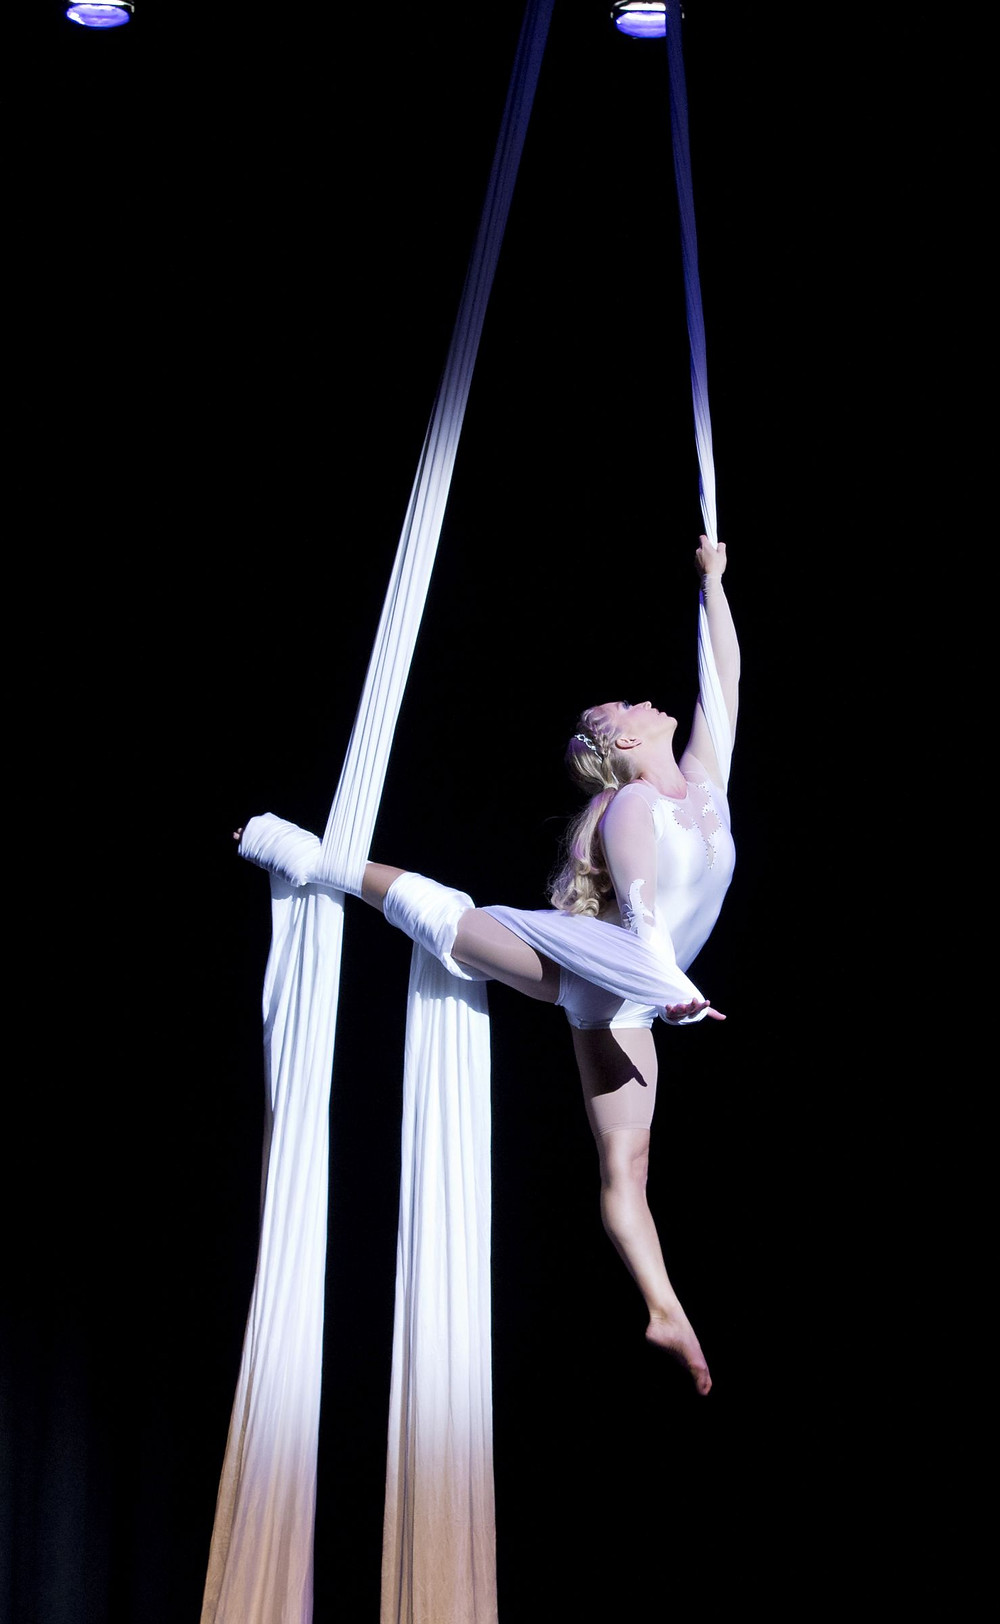 Aerial silks performer, Aerial Cheryl, aerialist in arabesque